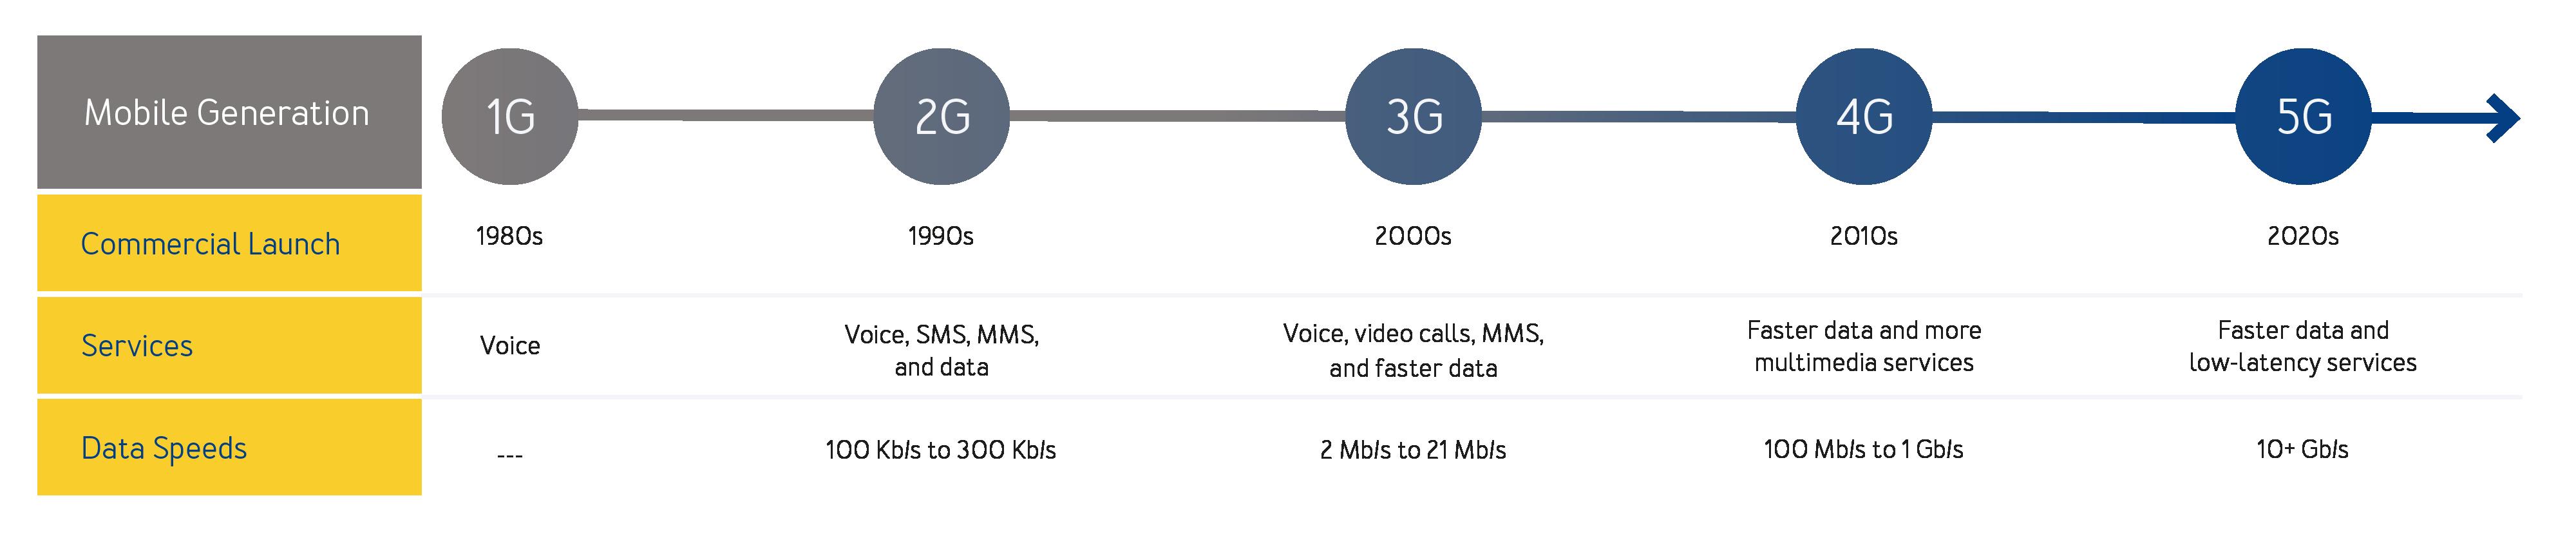 Mobile Generation Chart